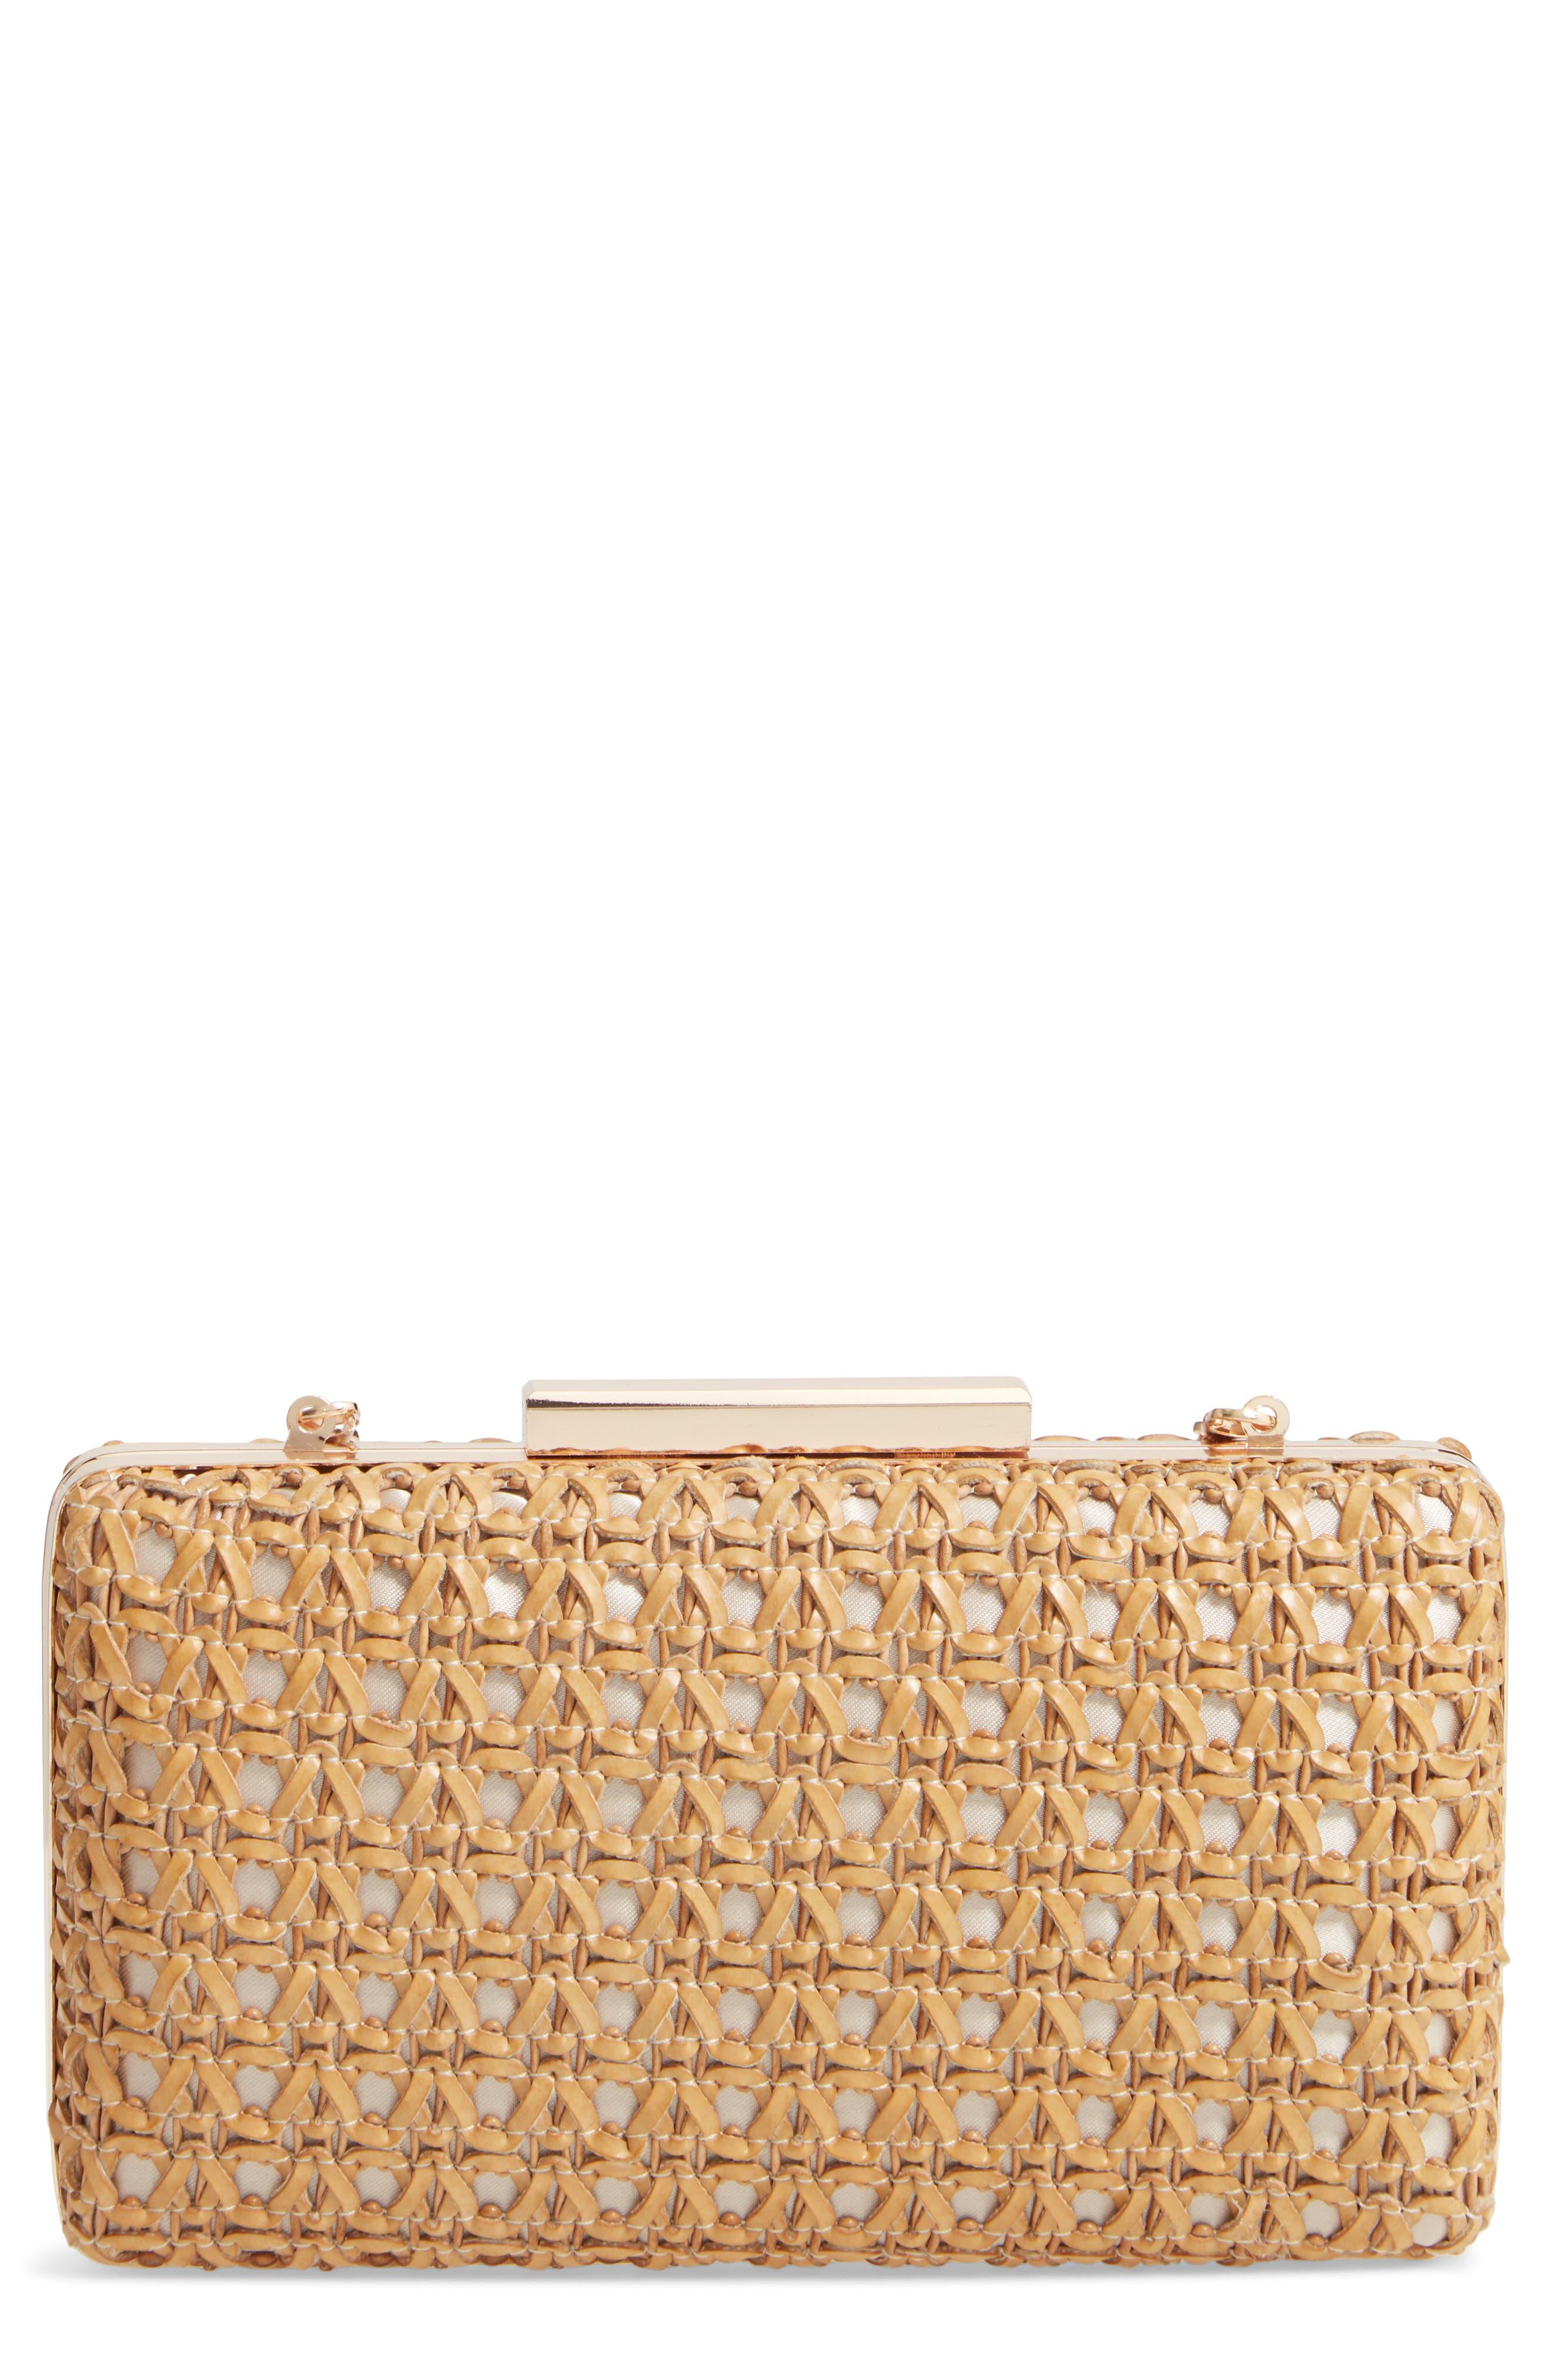 MALI + LILI Adalynn Woven Minaudiere Crossbody Bag, Main, color, GOLD/ COGNAC